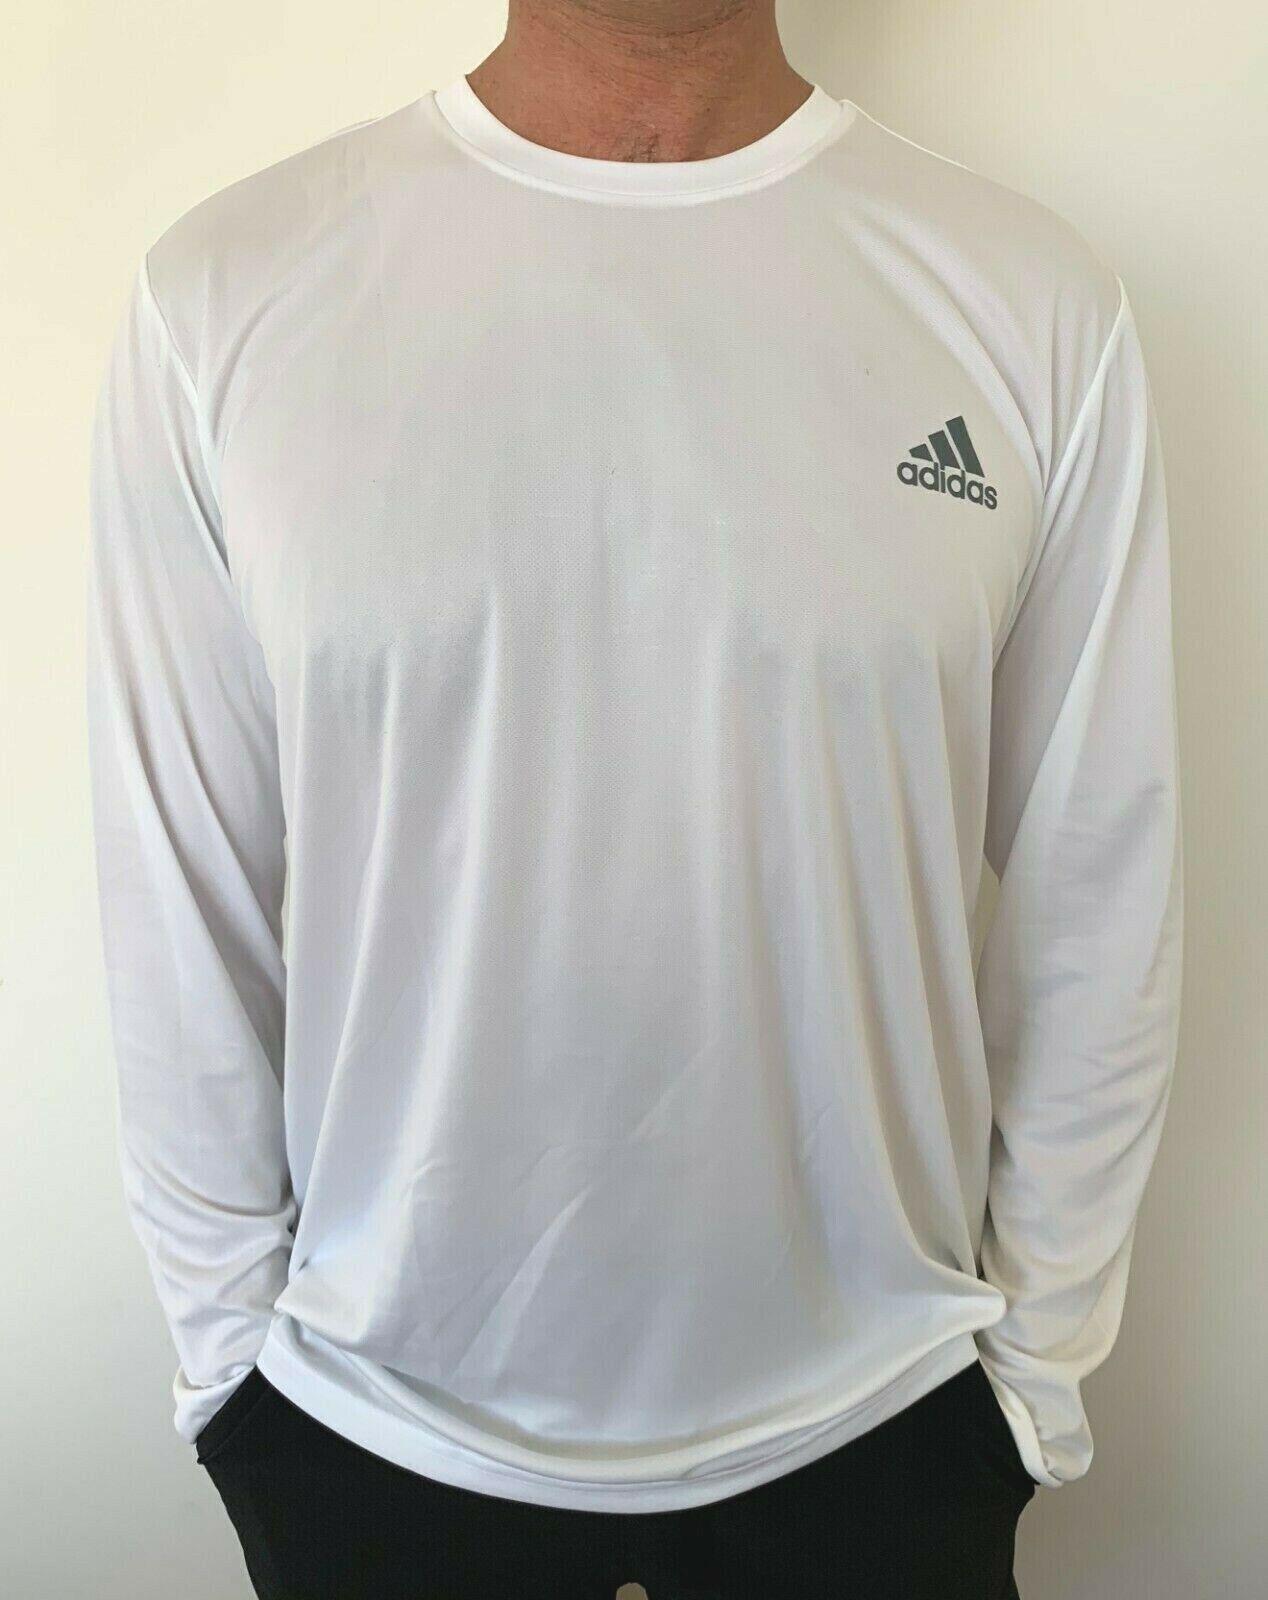 Aplastar para ver vergüenza  adidas Mens Climalite Long Sleeve T Shirt White Size S or XL for sale  online | eBay